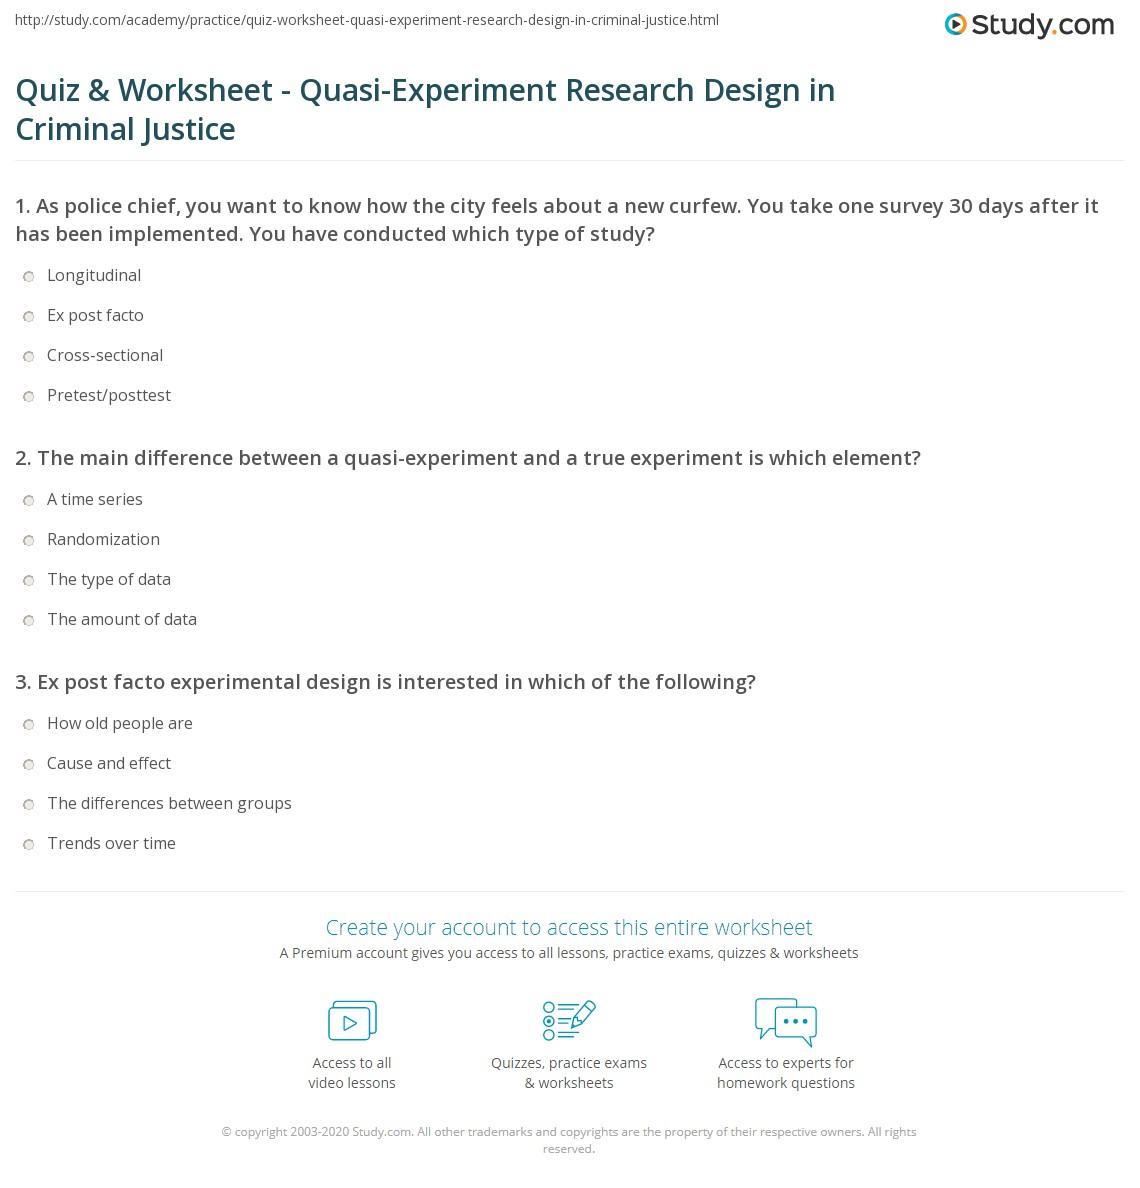 Science Experimental Design Worksheet: Quasi-Experiment Research Design In